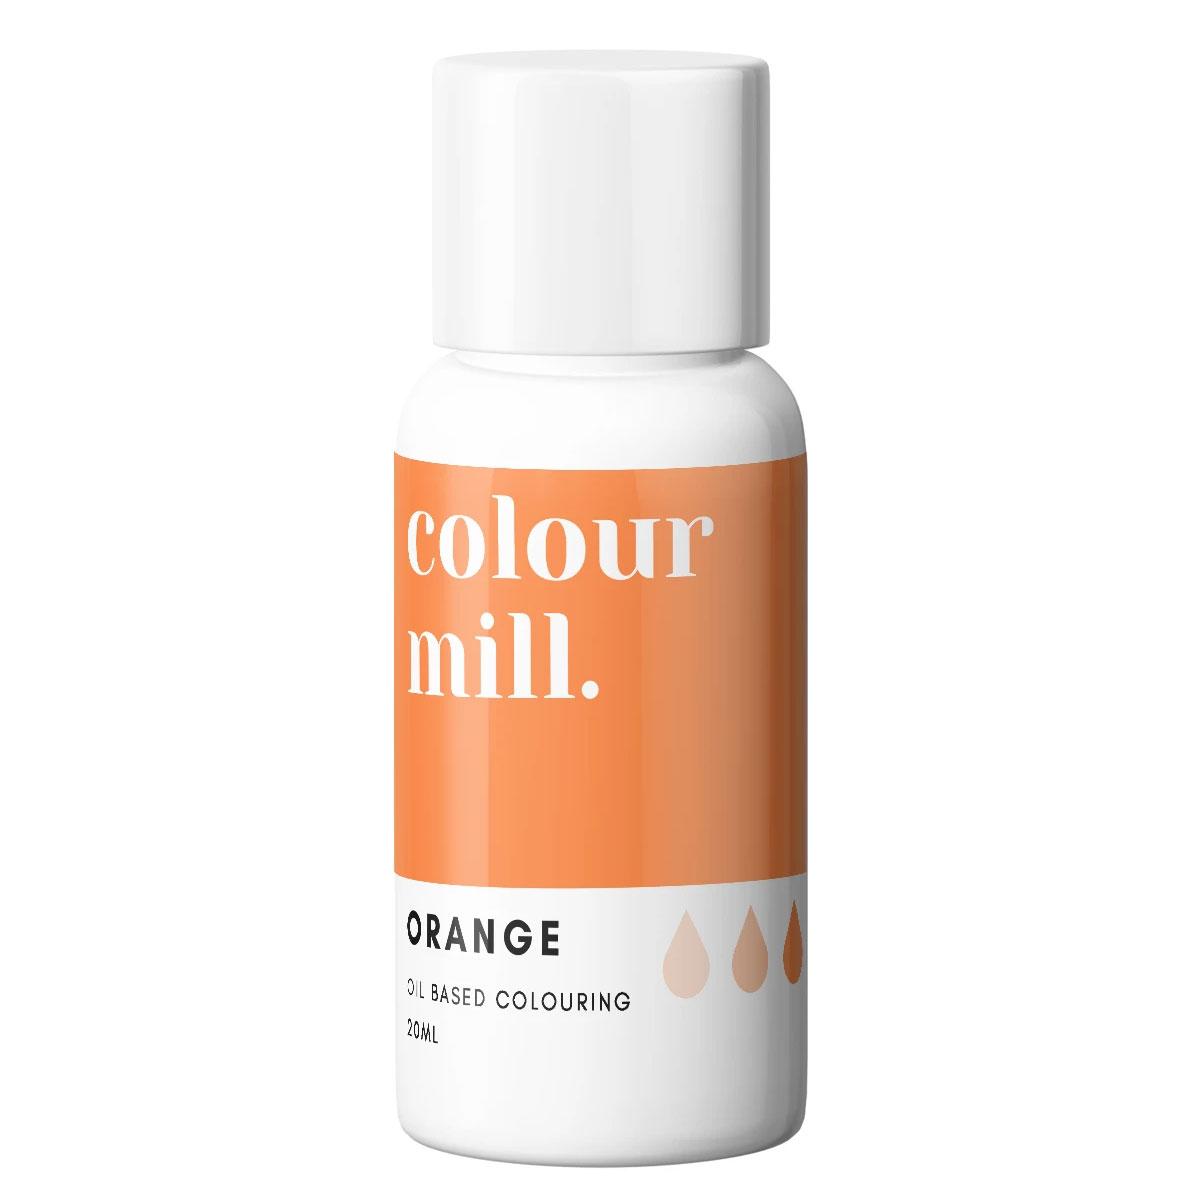 Colour Mill fettlösliche Lebensmittelfarbe - Orange 20ml